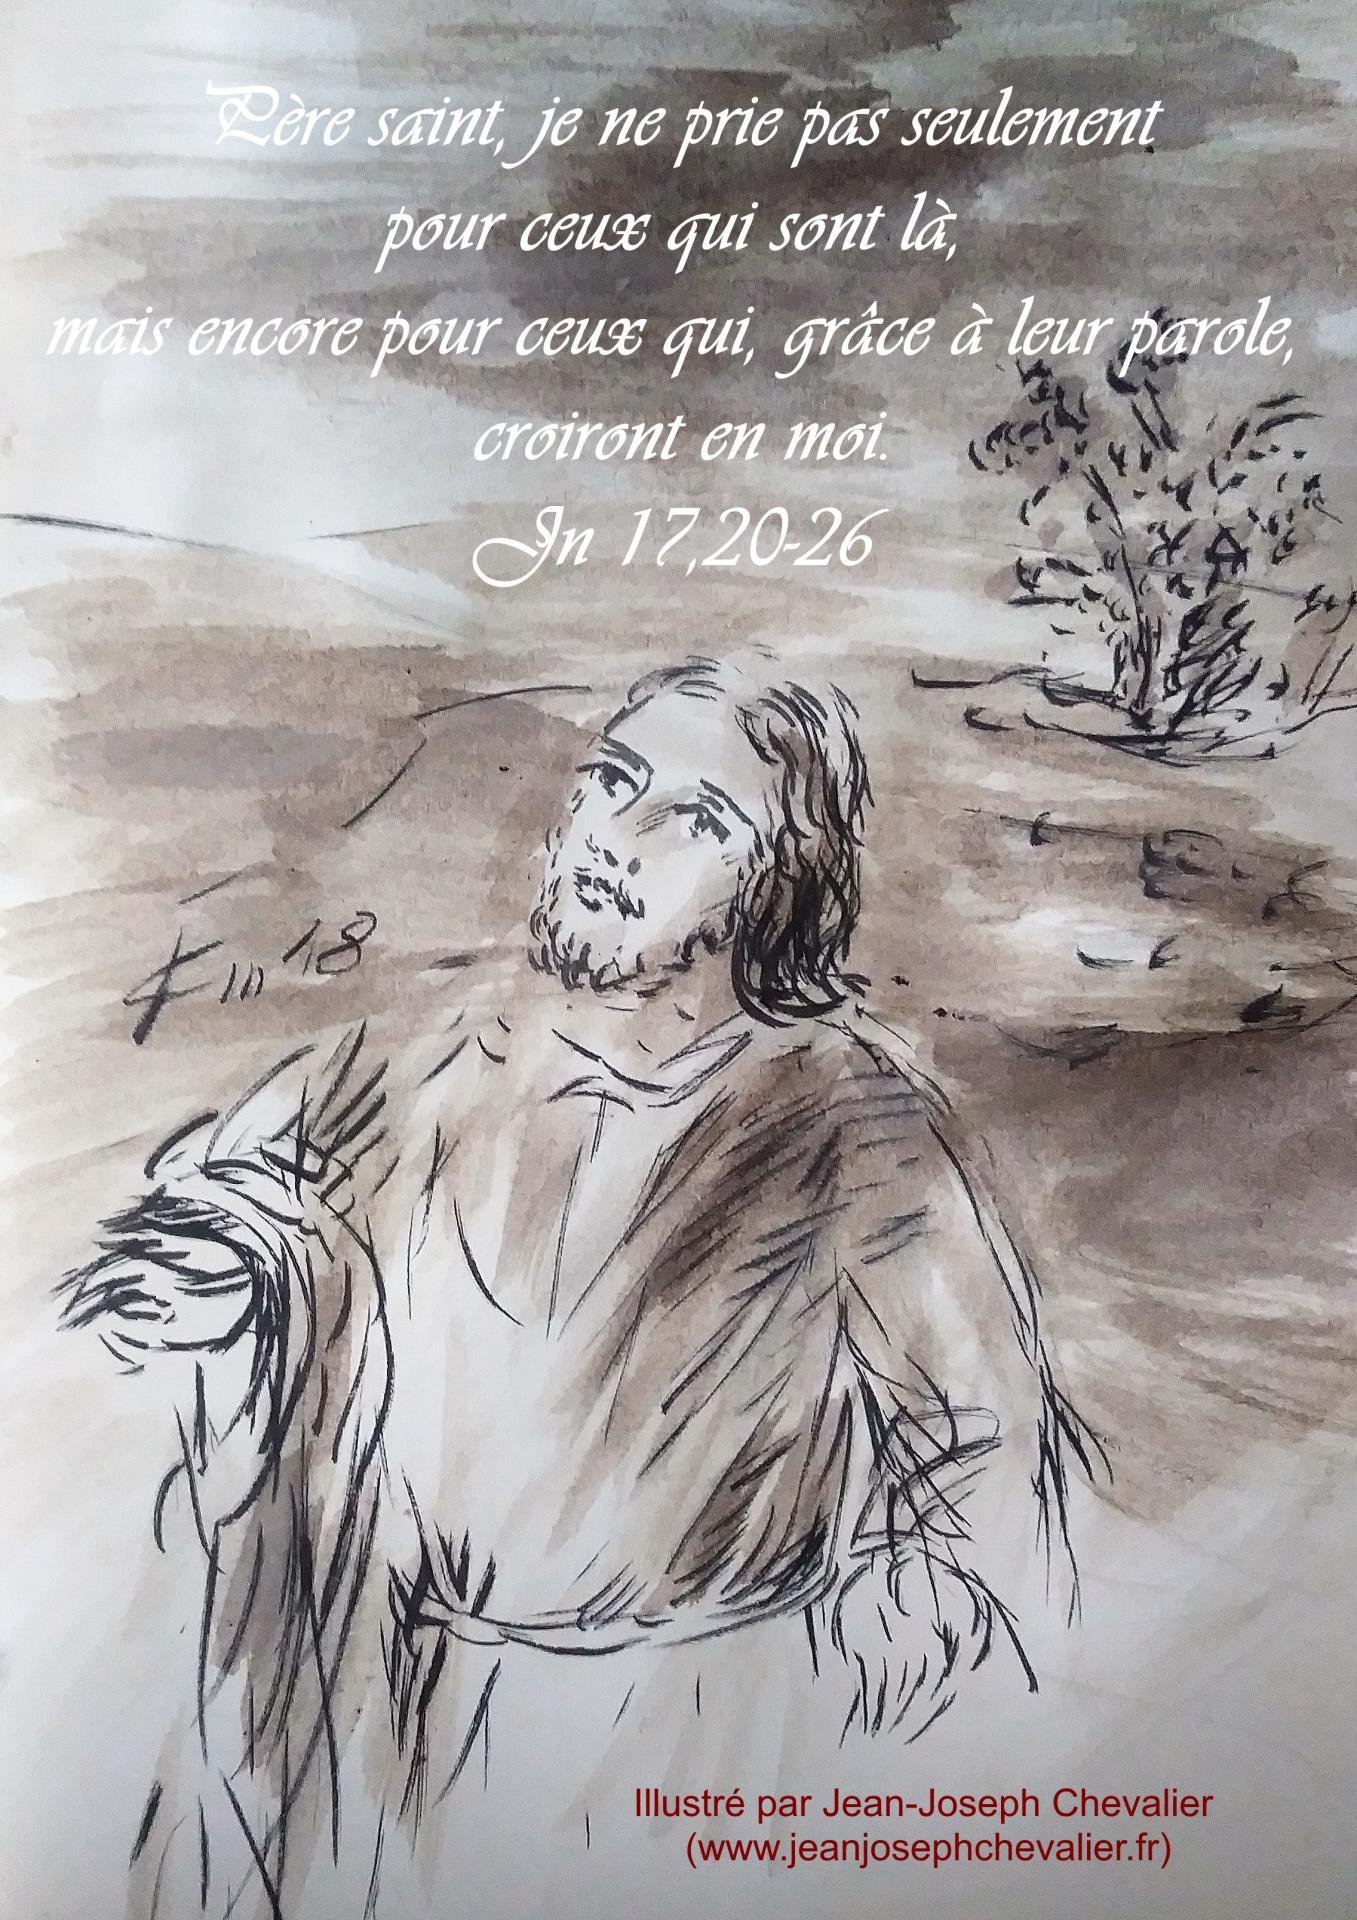 Evangile du jour illustré du Jeudi 17 Mai 2018 par un dessin au lavis